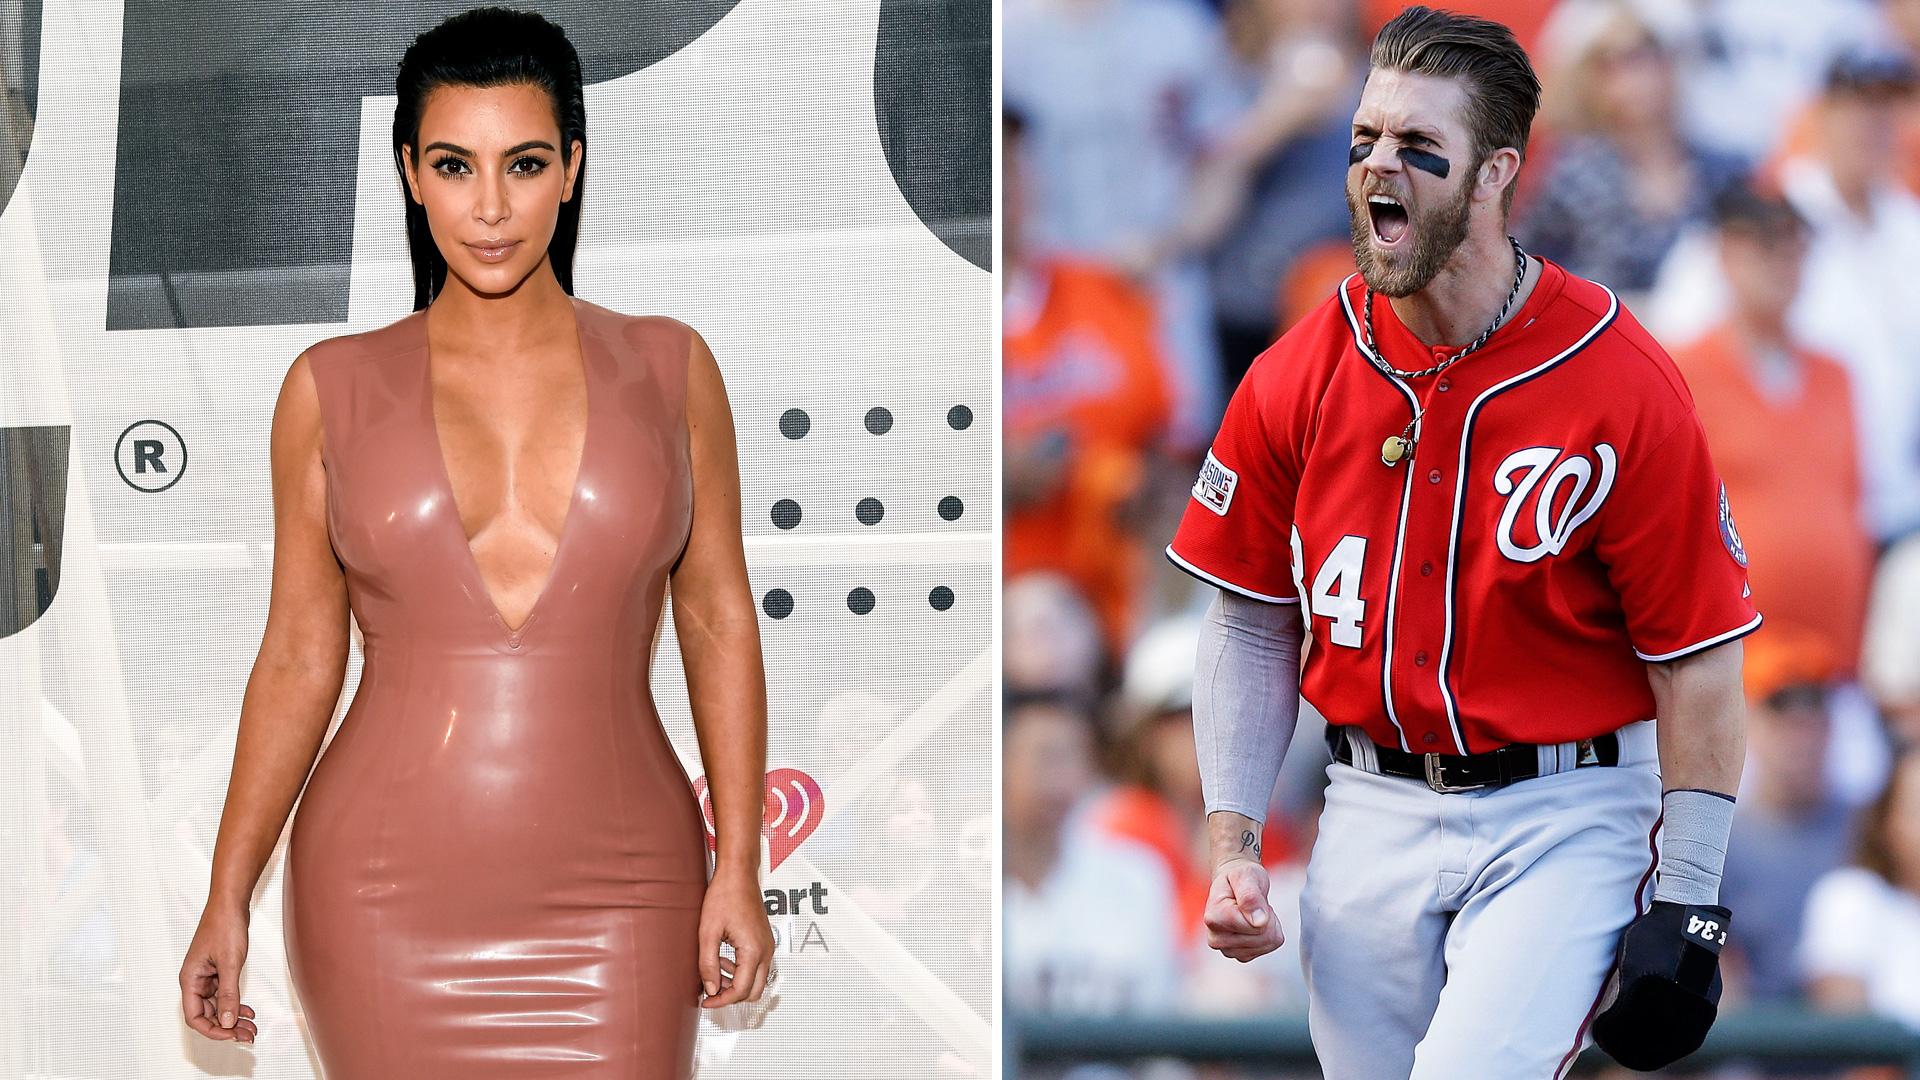 SPLIT Kim Kardashian Bryce Harper-031116-GETTY-FTR.jpg